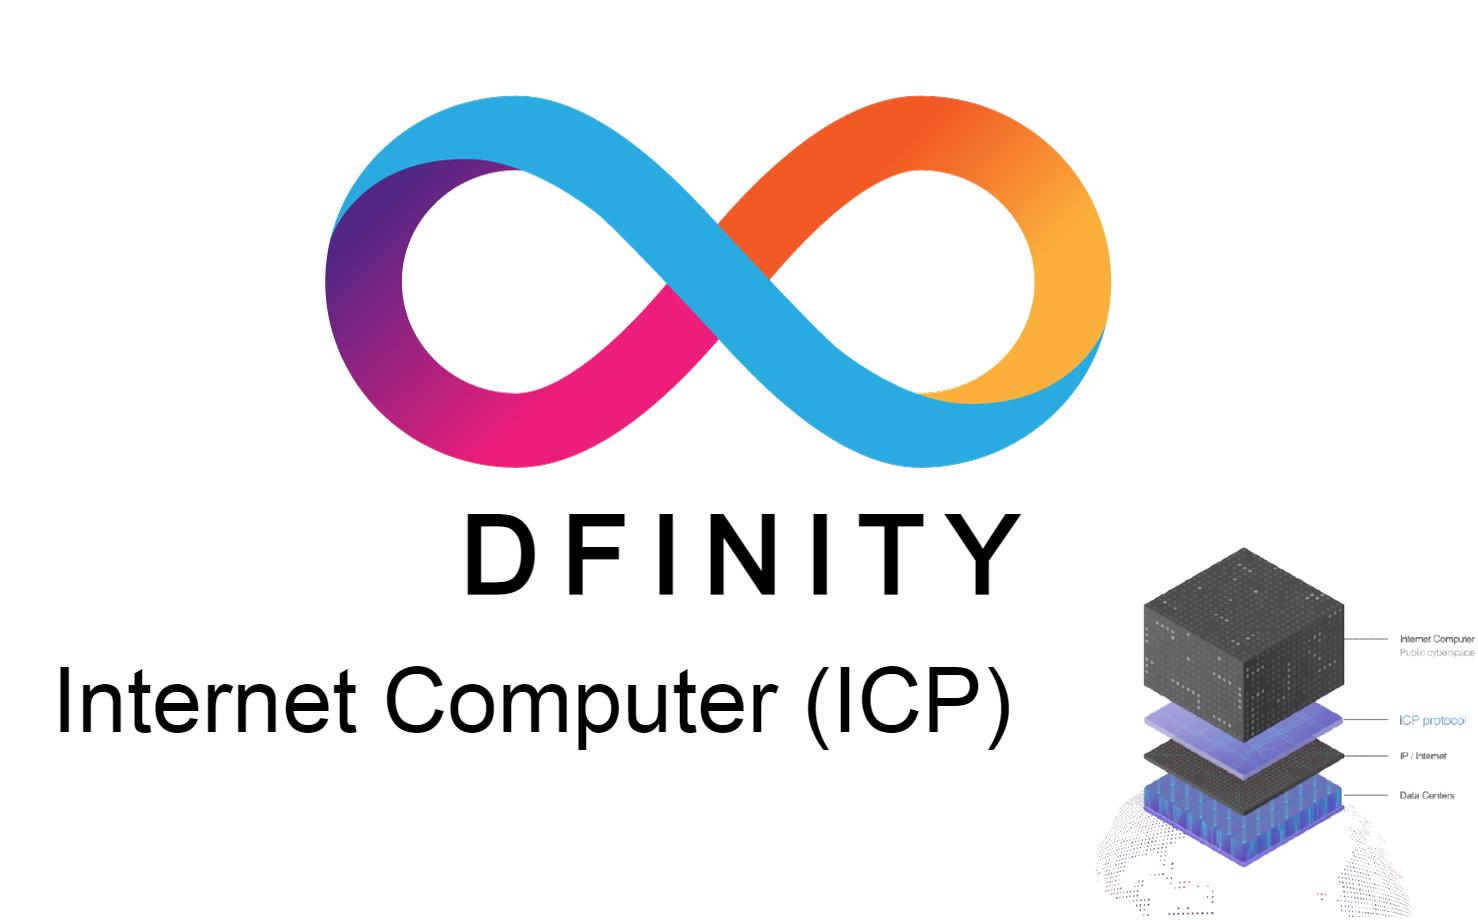 Internet Computer (ICP) kryptoměna, Dfinity